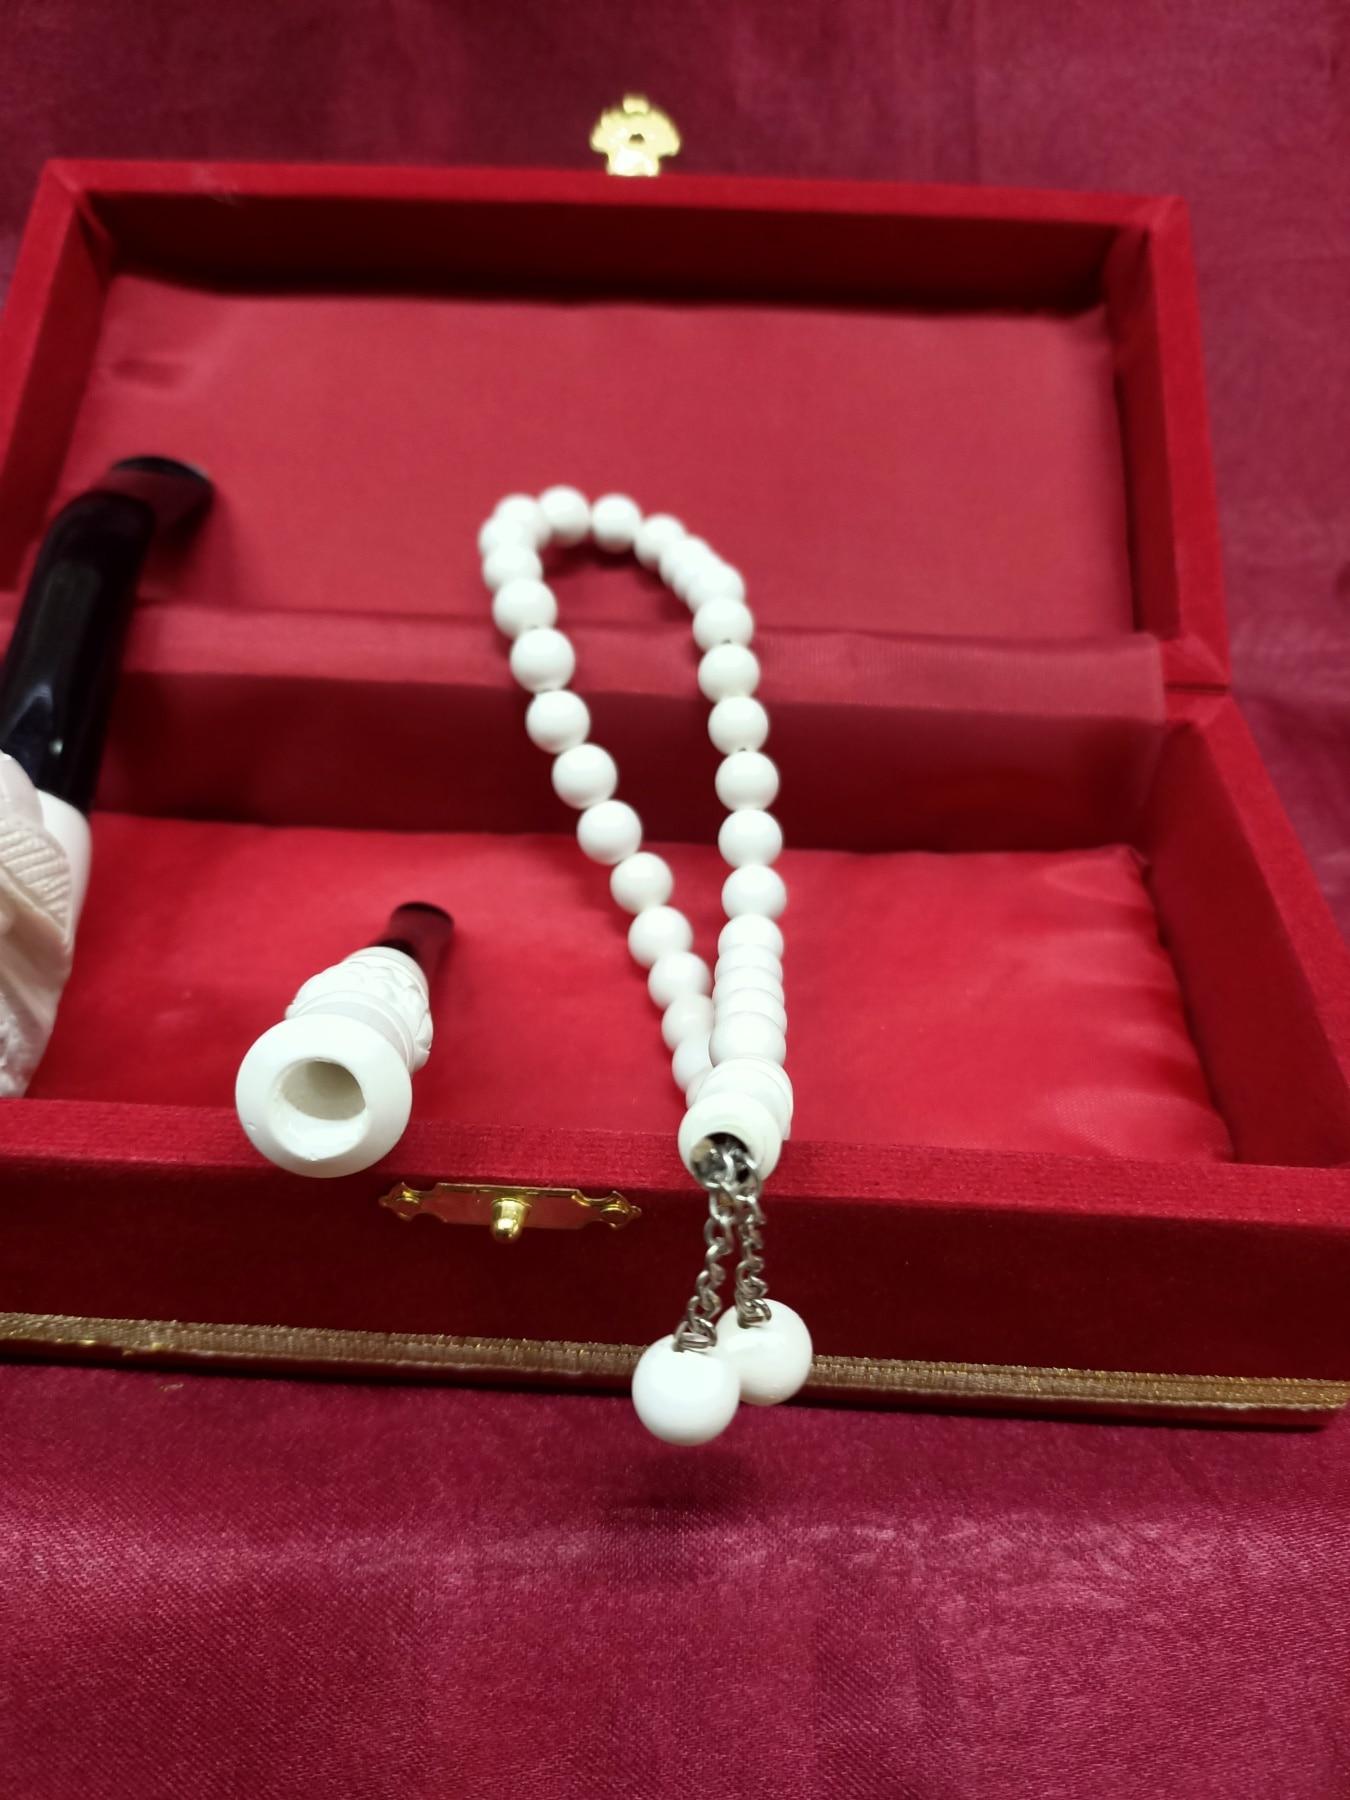 High Quality Meerschaum Set Master Made Smoking Tobacco Pipe New Cigar Sepiolite Best Gift for Friend Eskisehir made in Turkey enlarge